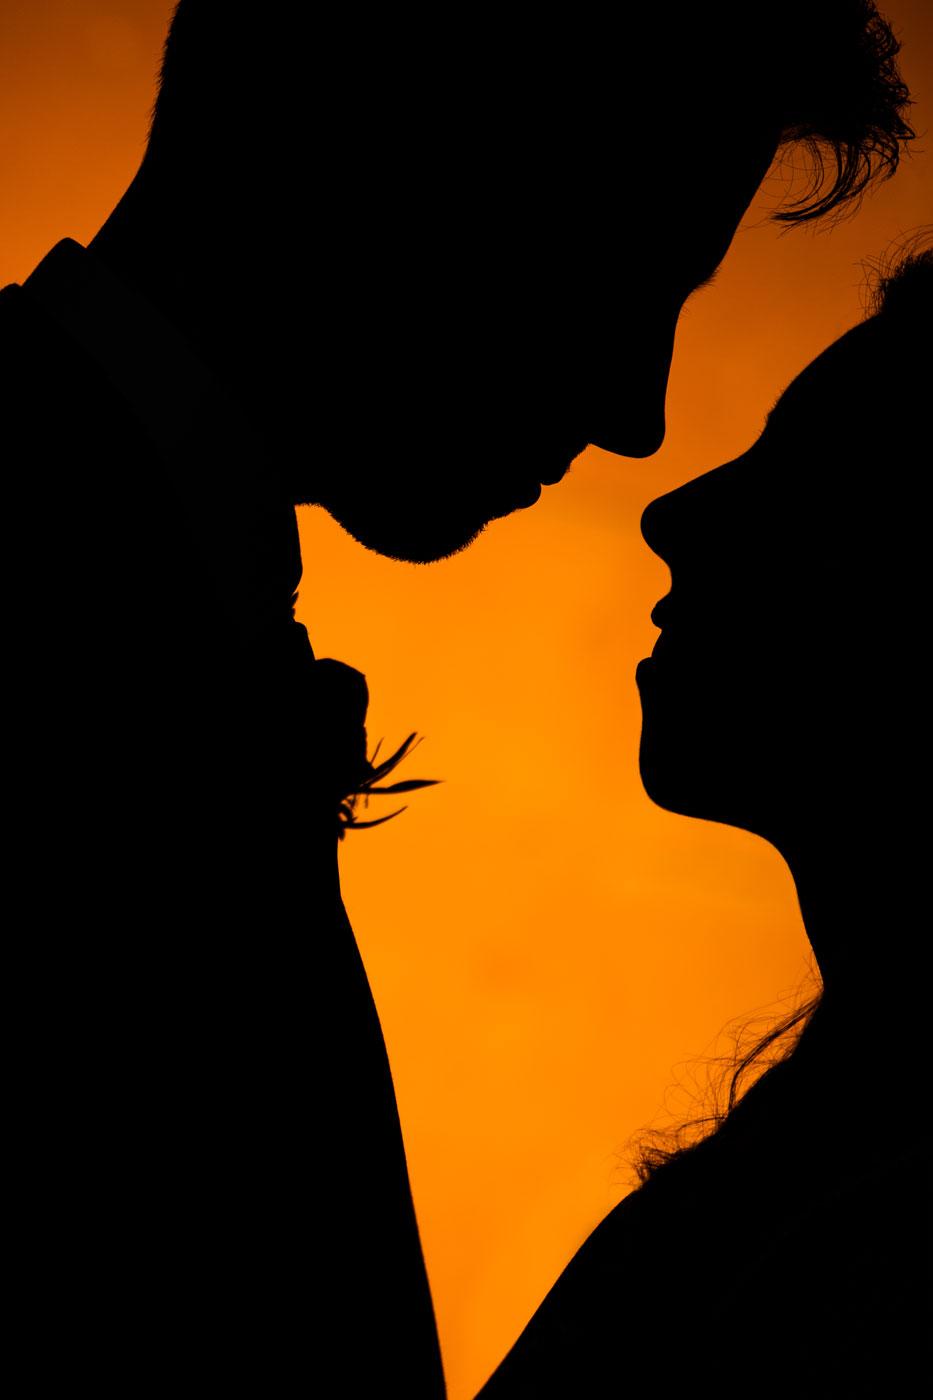 Eynsham Hall silhouette wedding photography